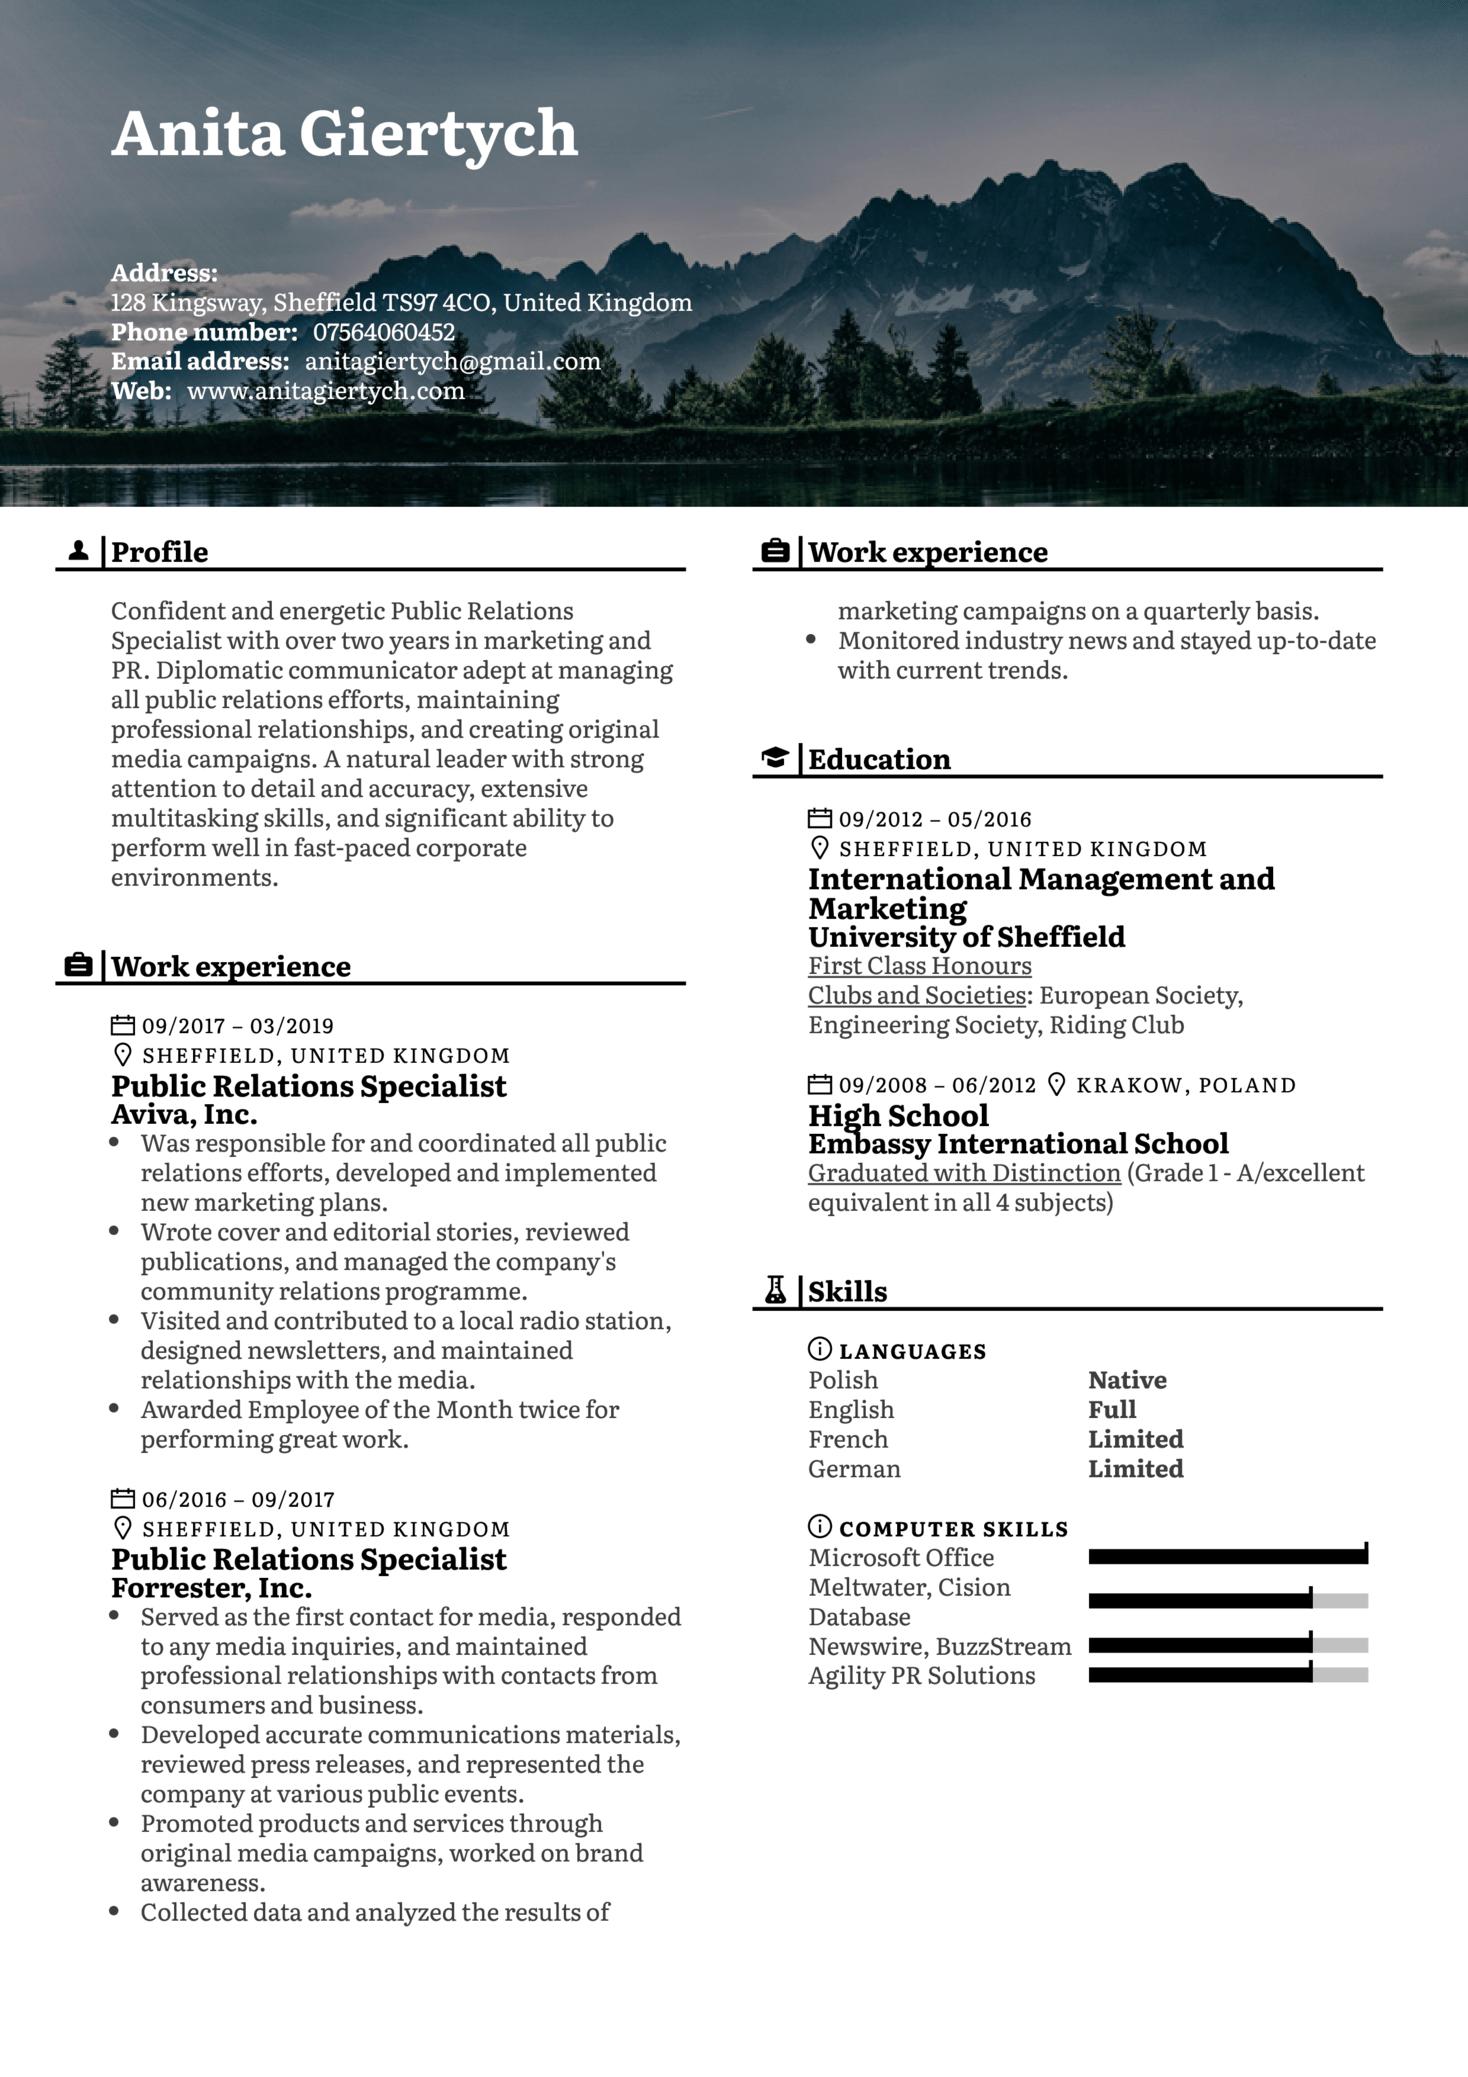 Public Relations Specialist Resume Sample (Part 1)